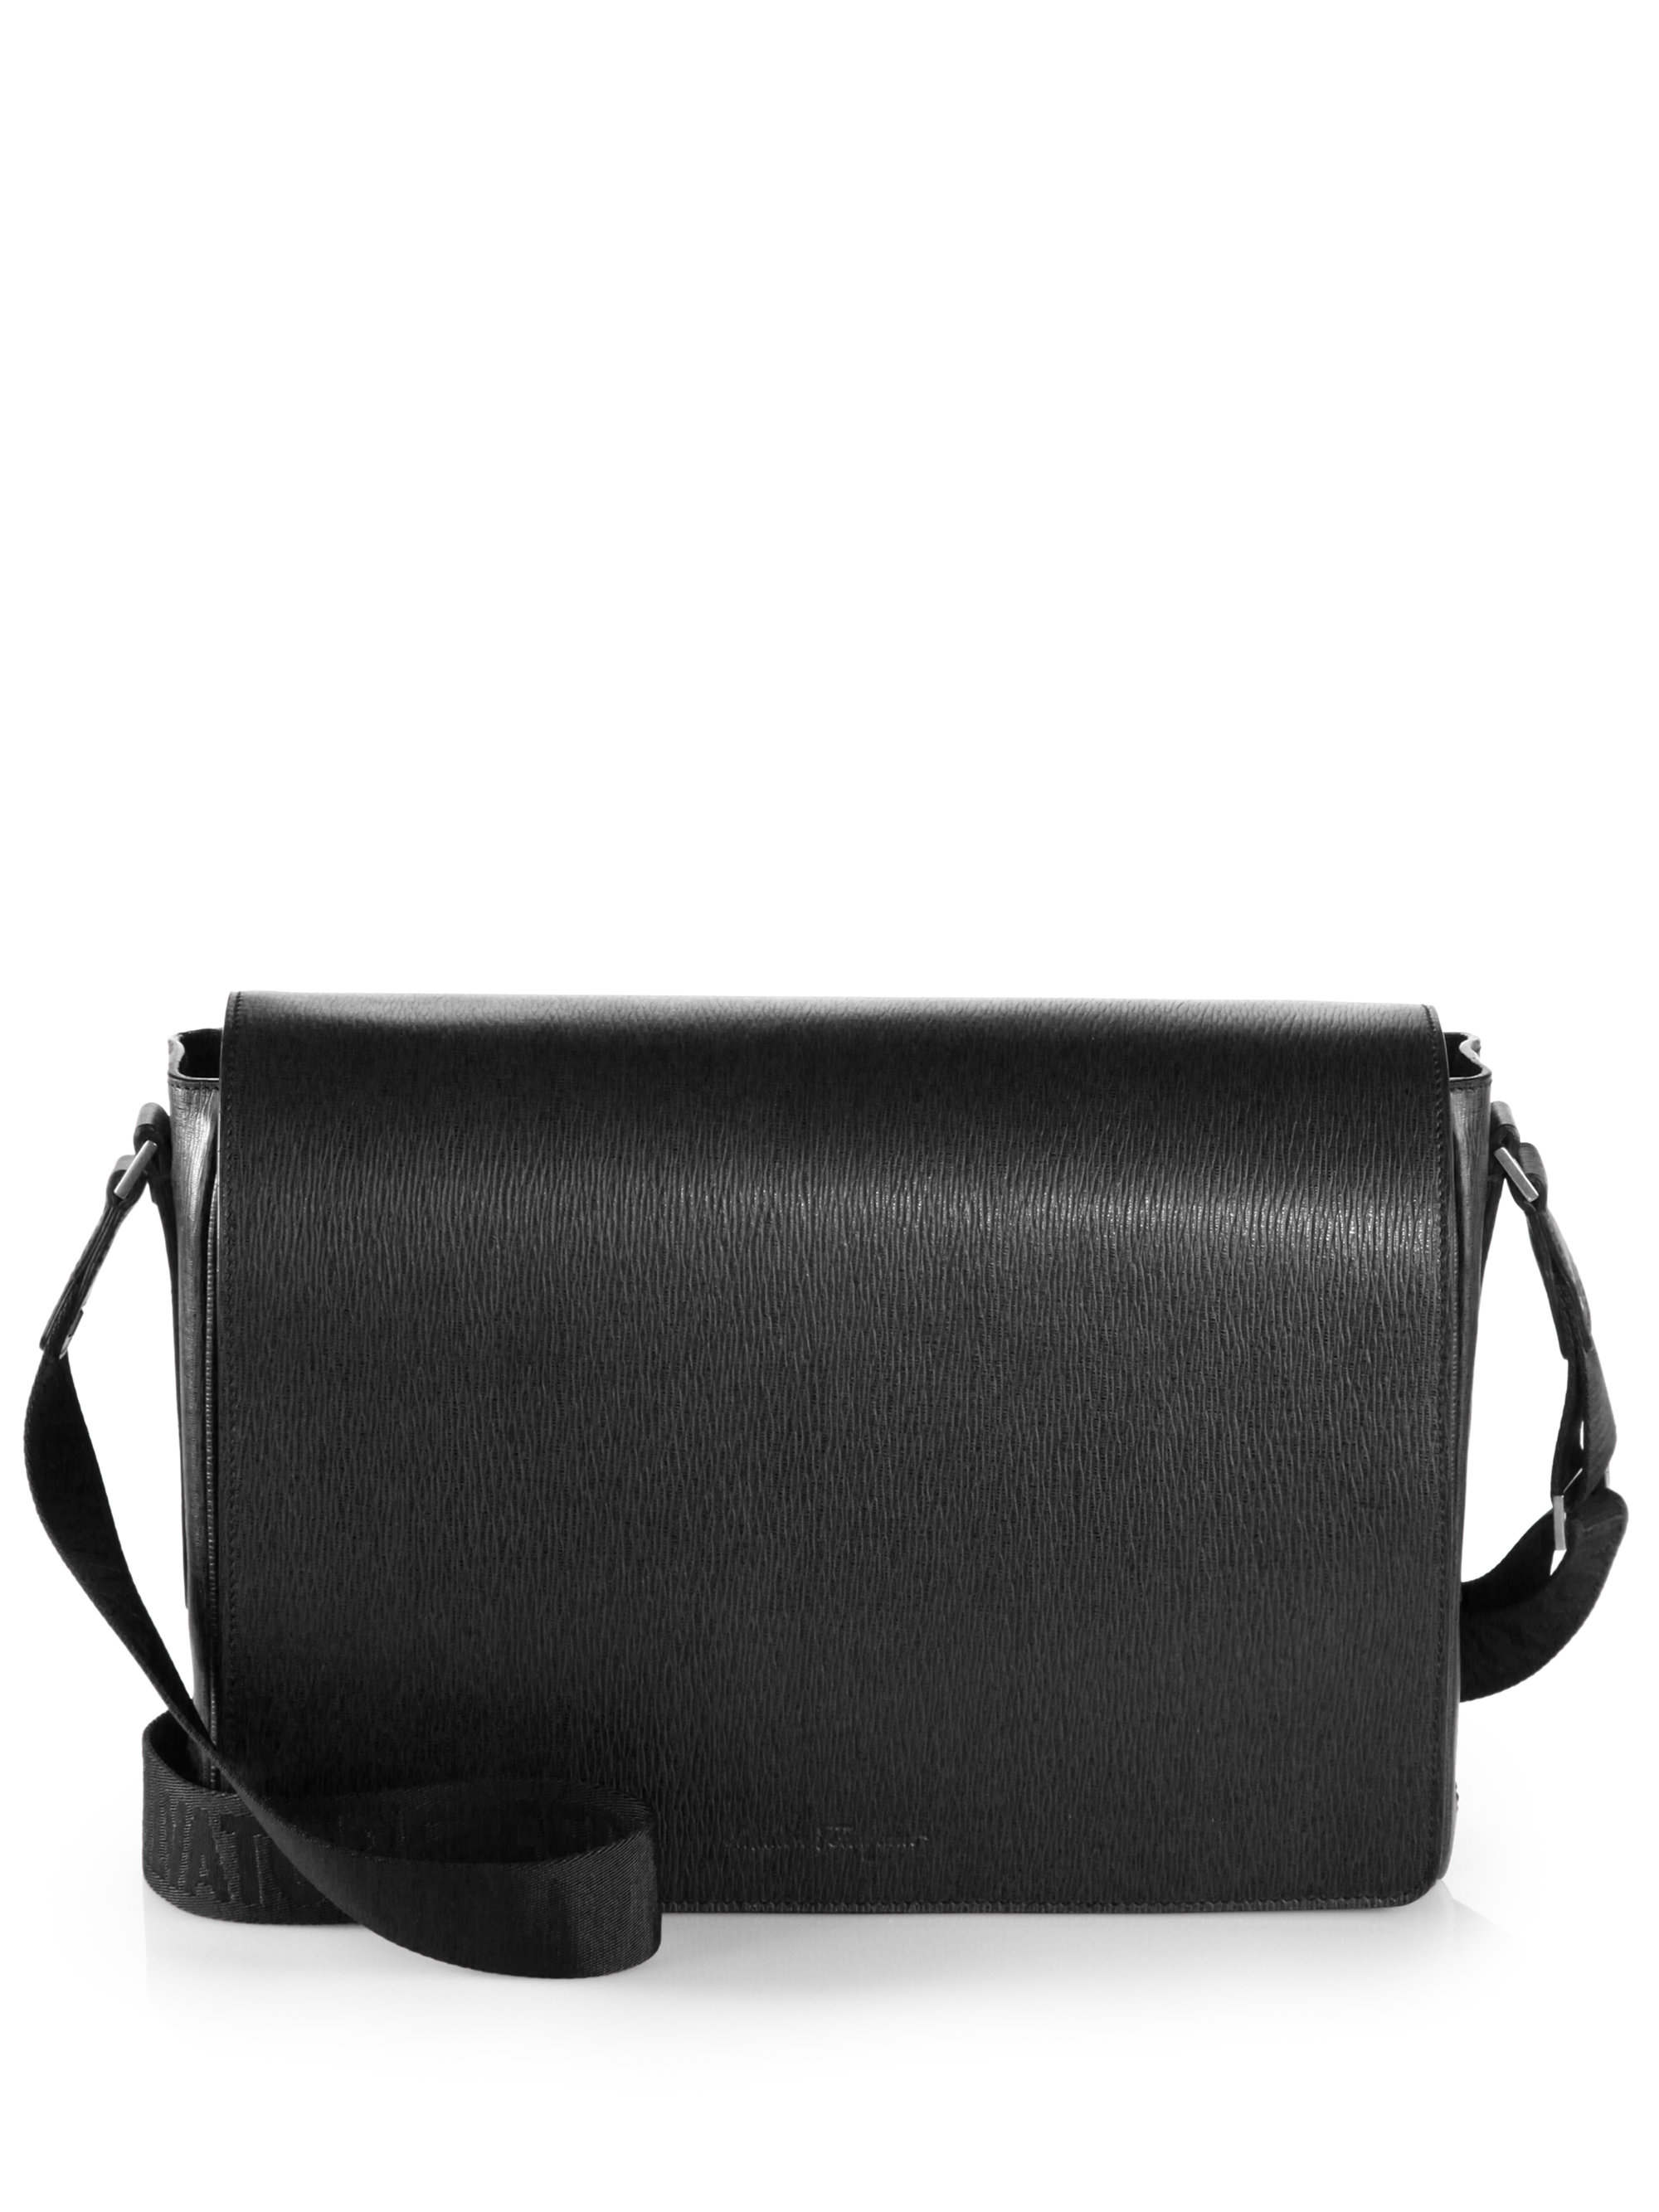 f5b3bb131b Lyst - Ferragamo Leather Messenger Bag in Black for Men